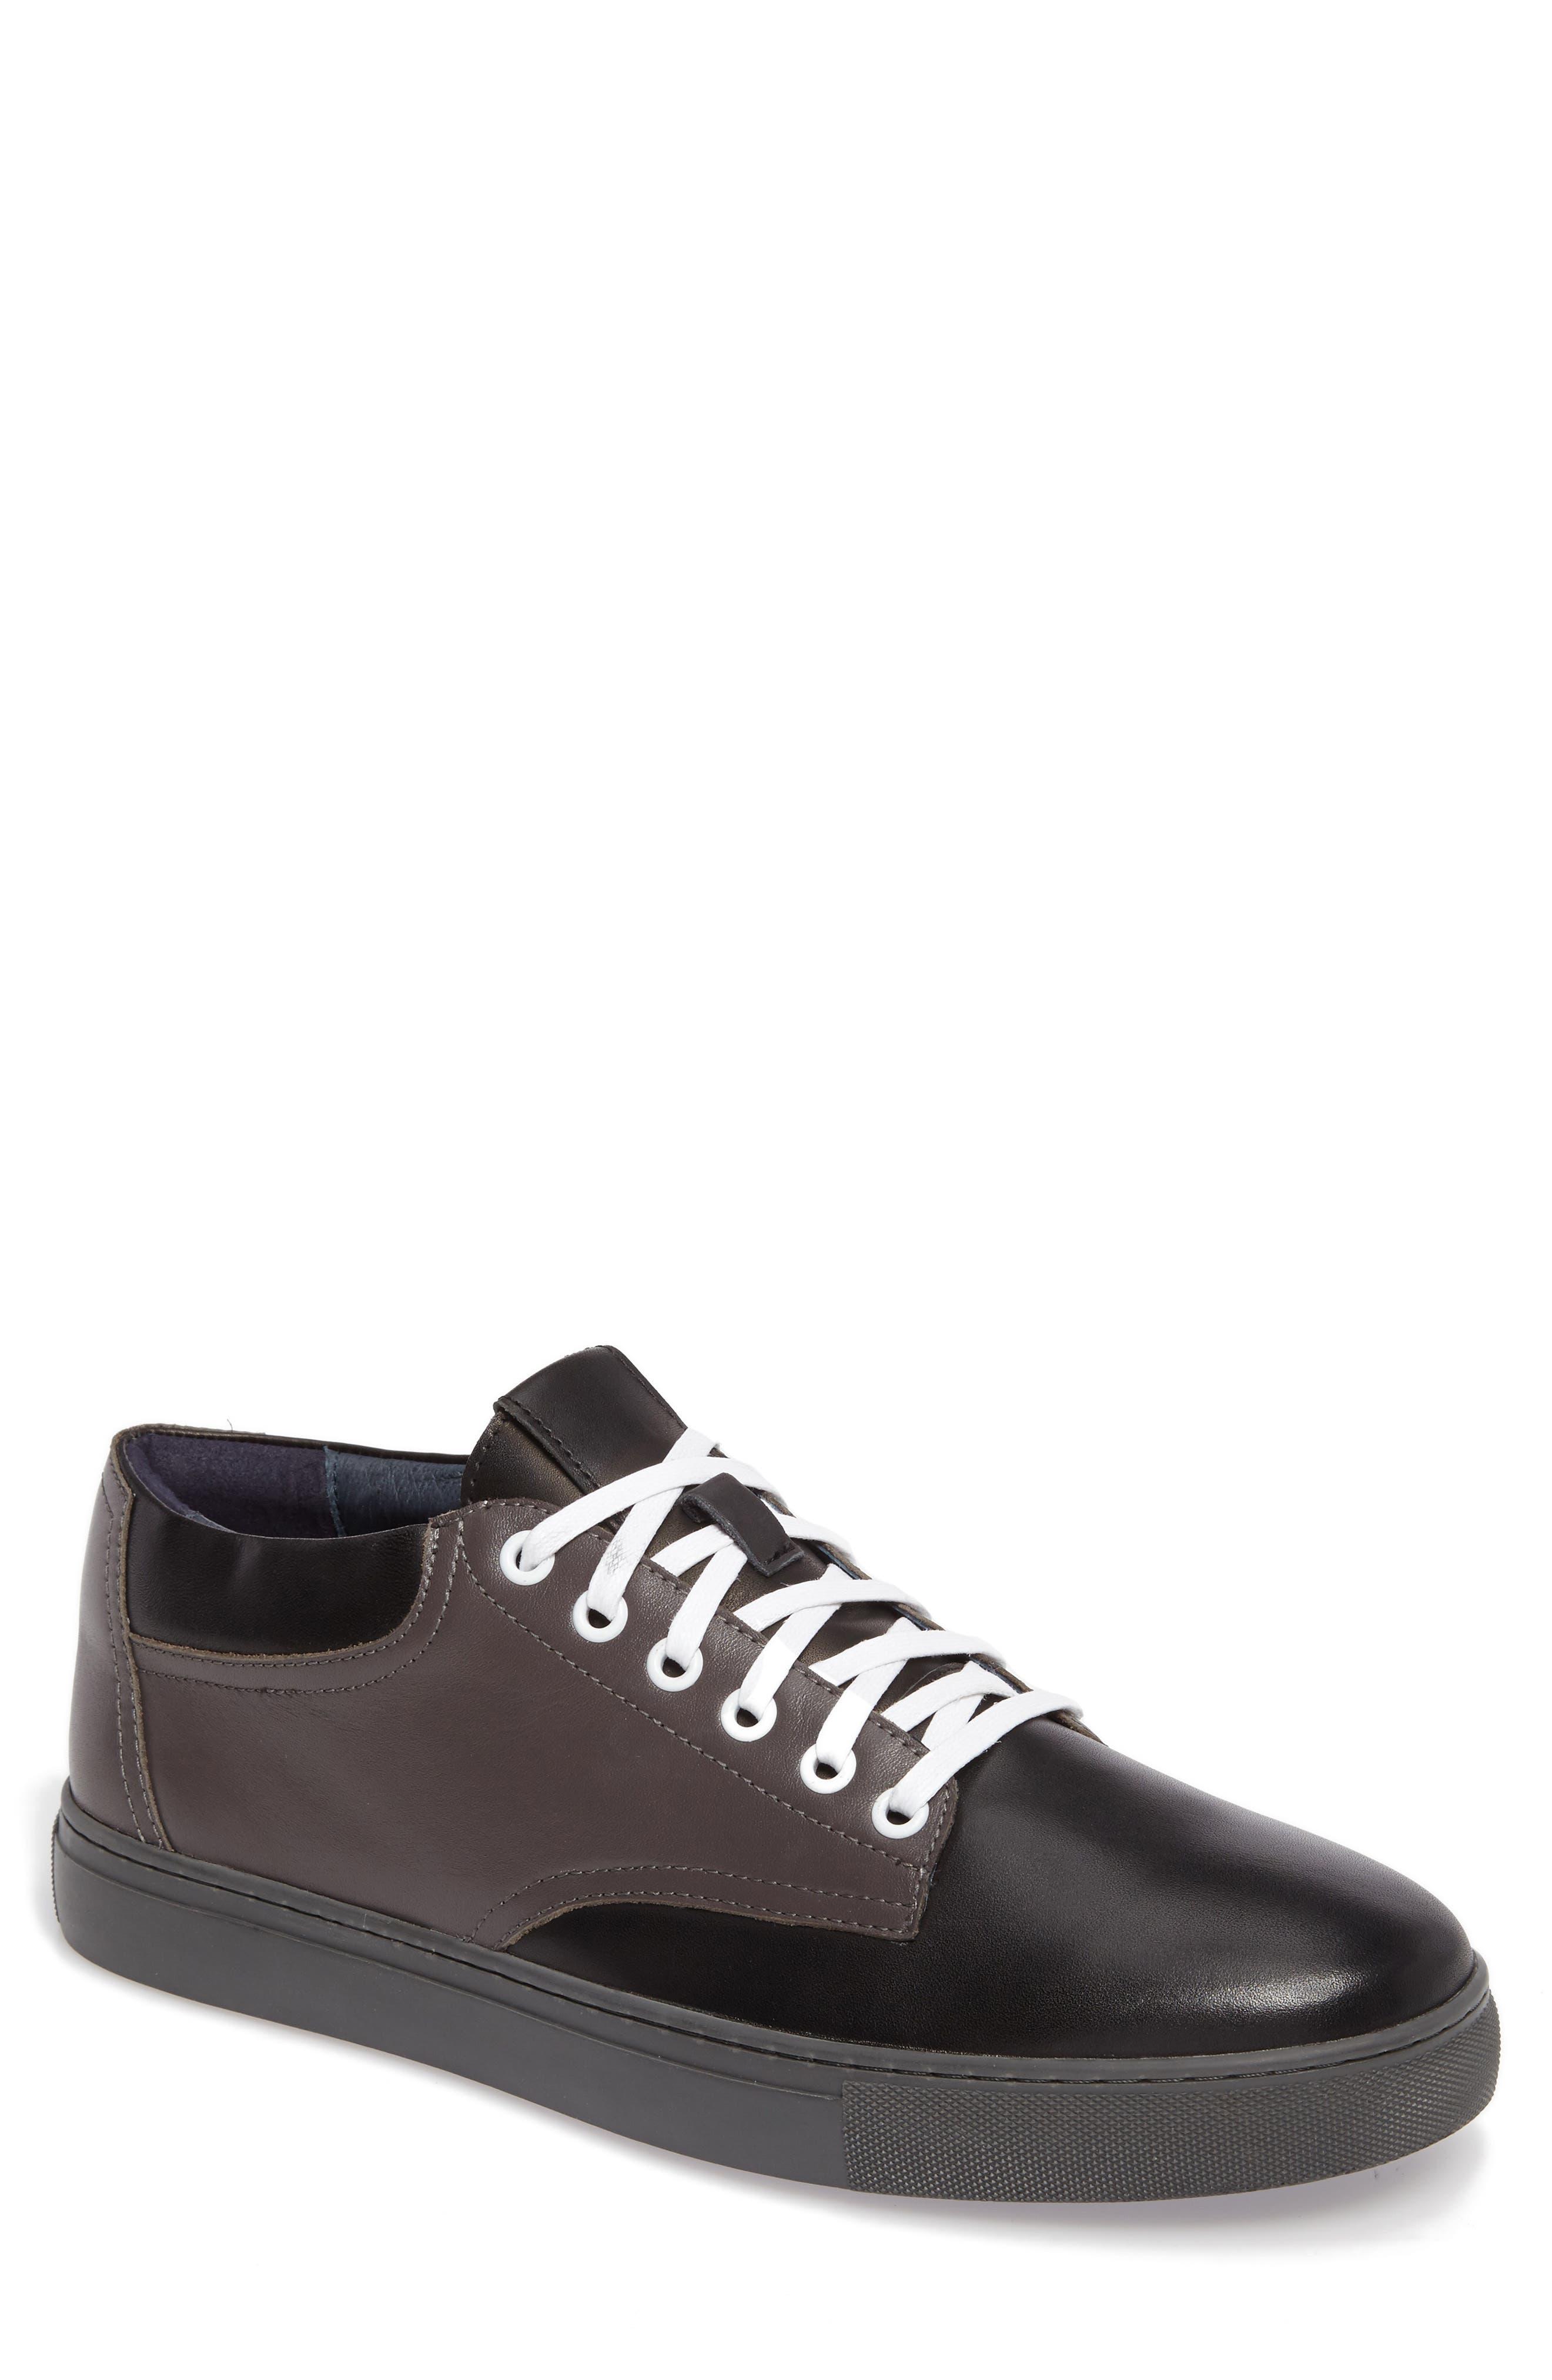 Alternate Image 1 Selected - Zanzara Ralston Sneaker (Men)